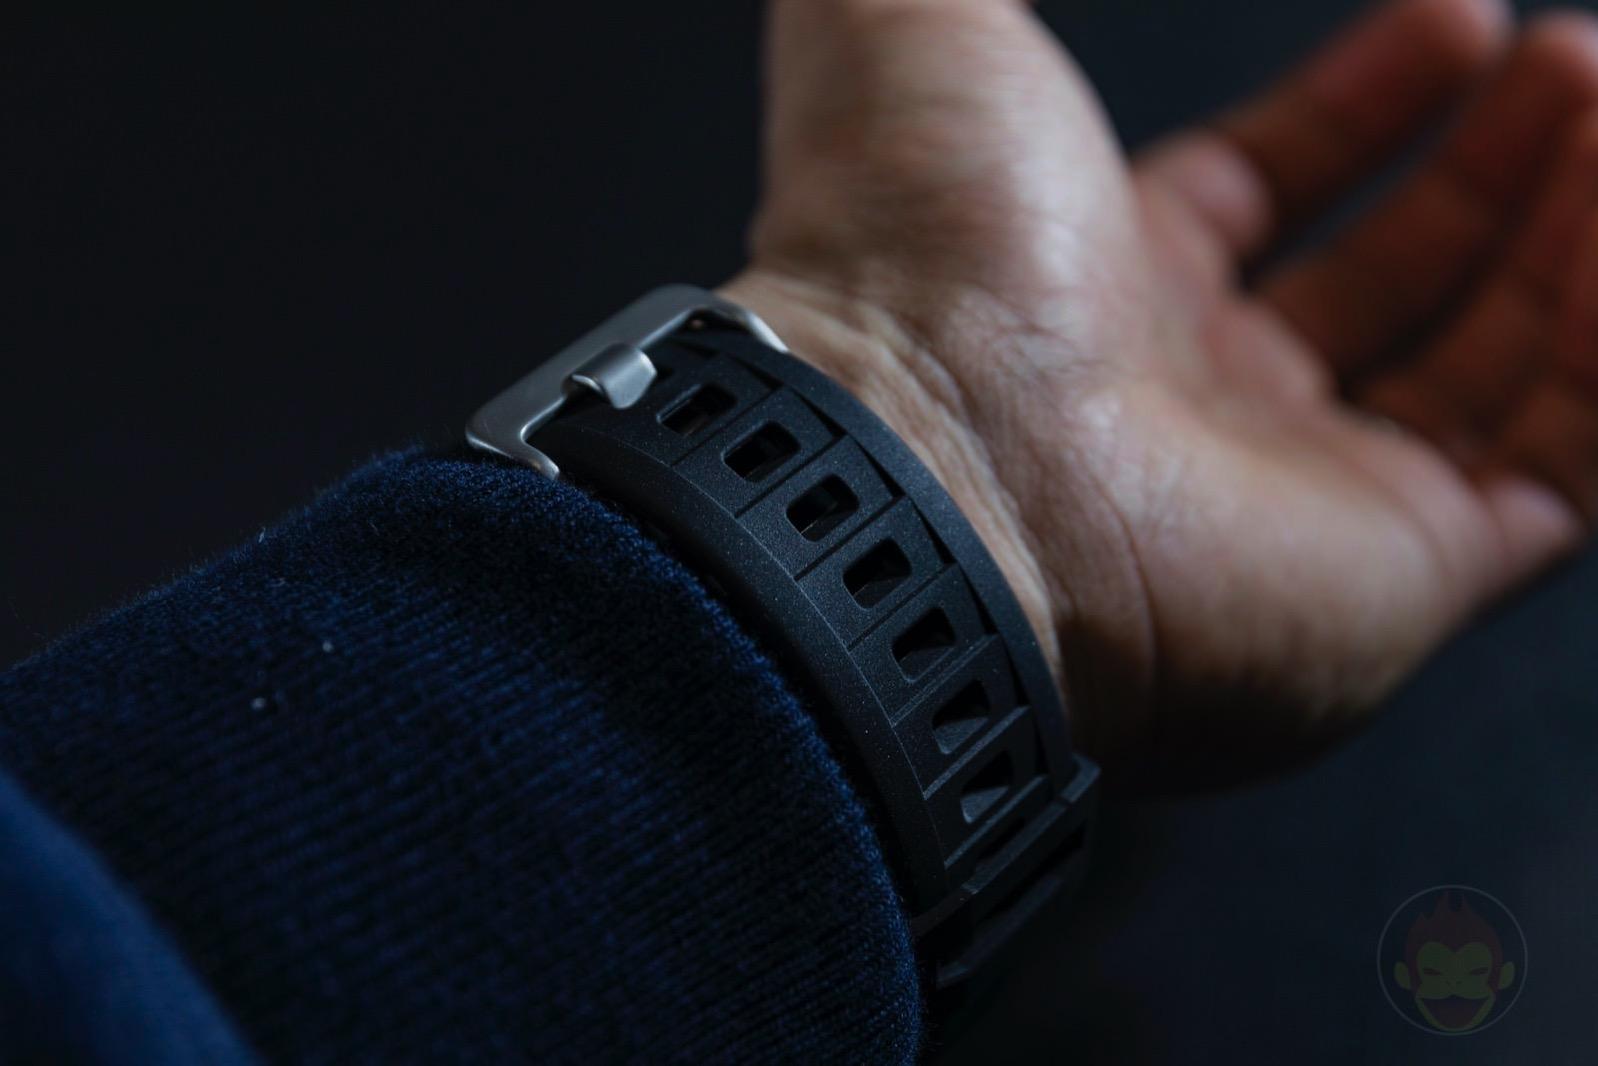 Spigen-Rugged-Armor-Pro-Apple-Watch-Band-and-case-15.jpg